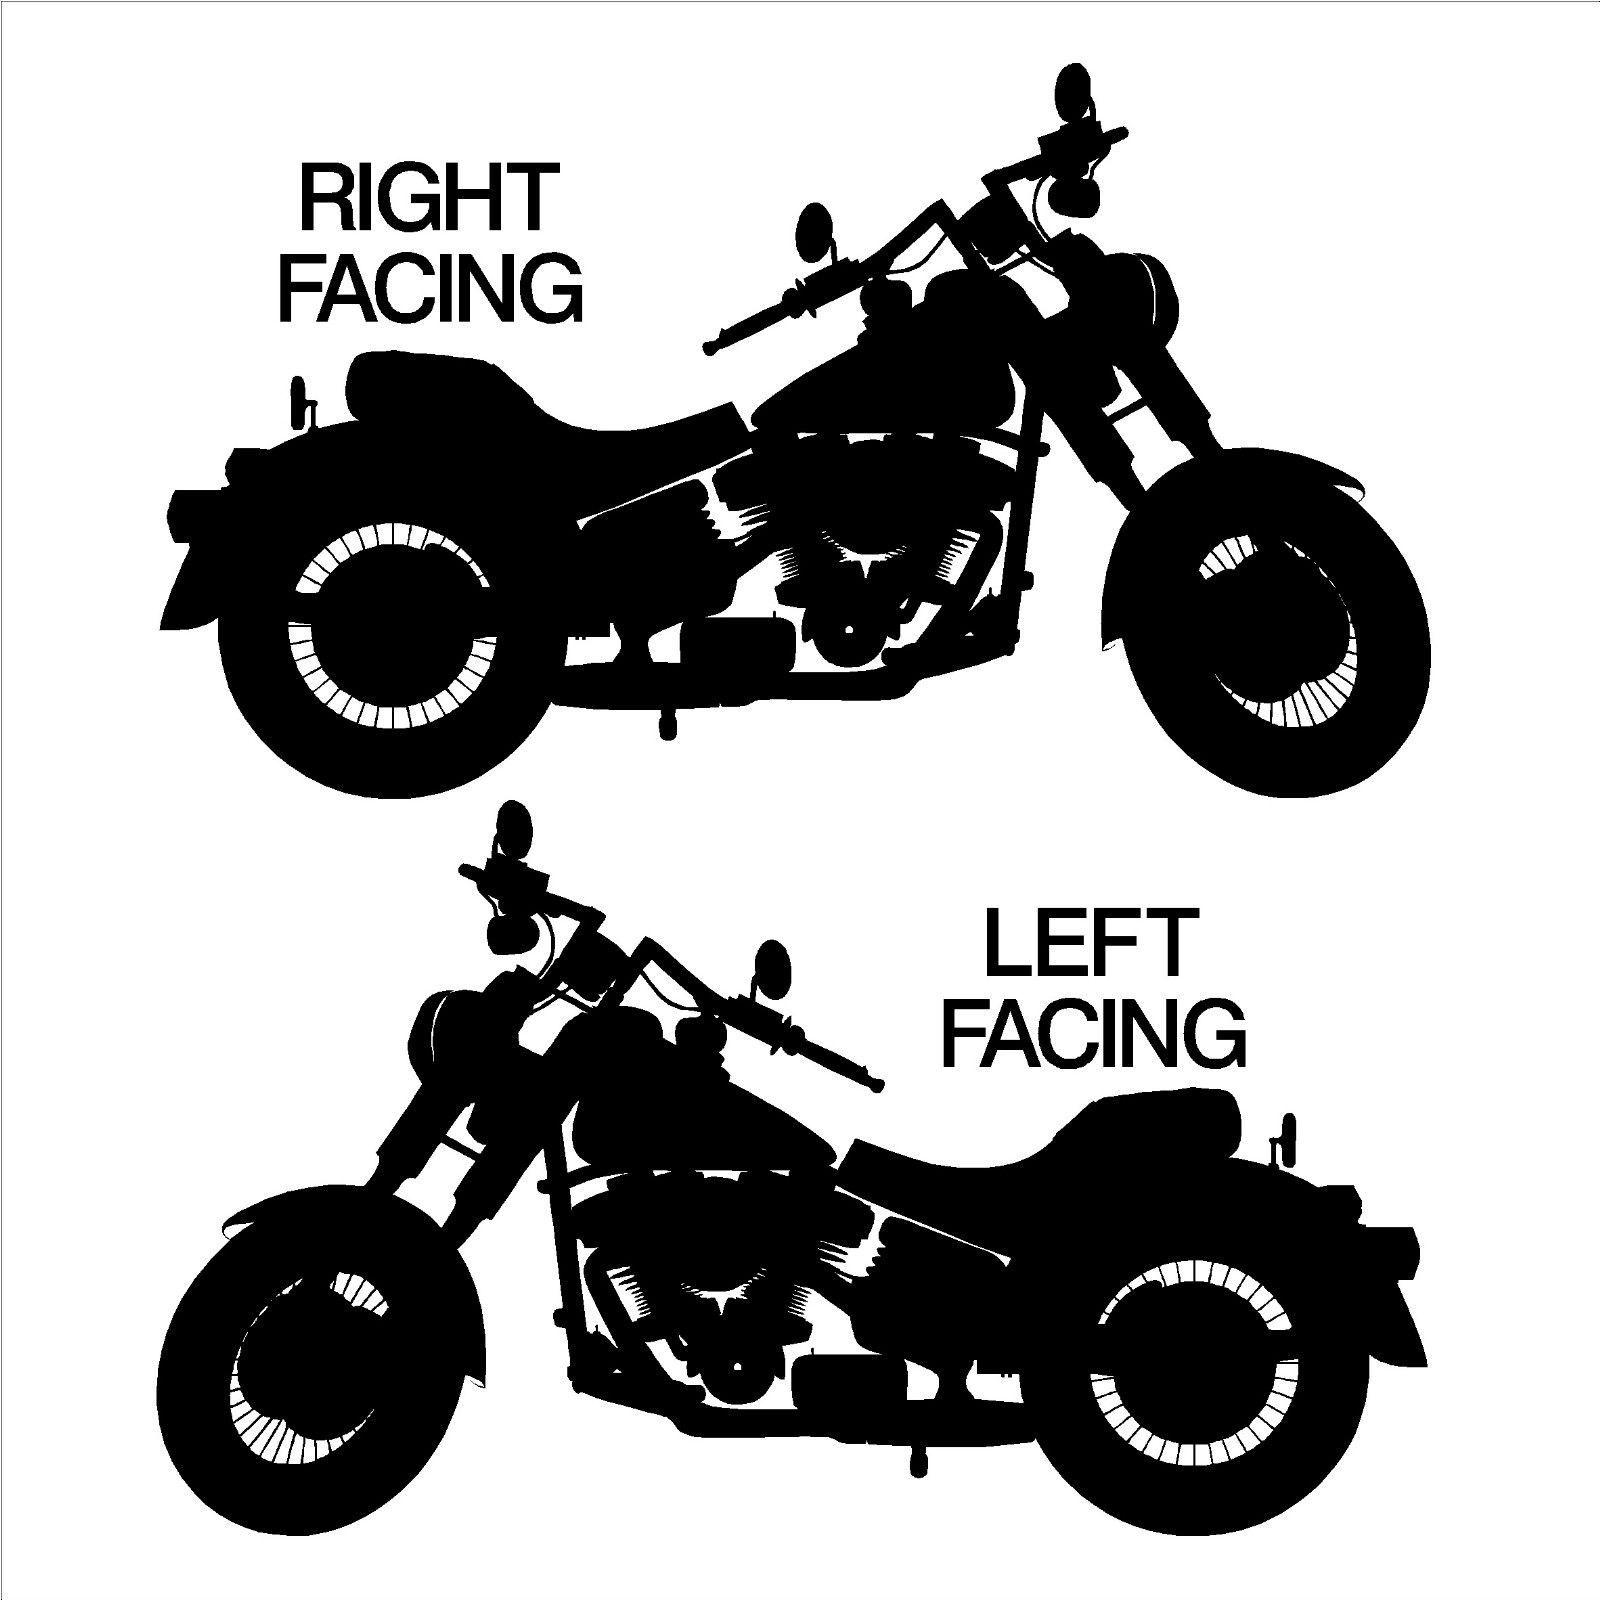 Harley davidson motorbike chopper vinyl wall art sticker decal ebay